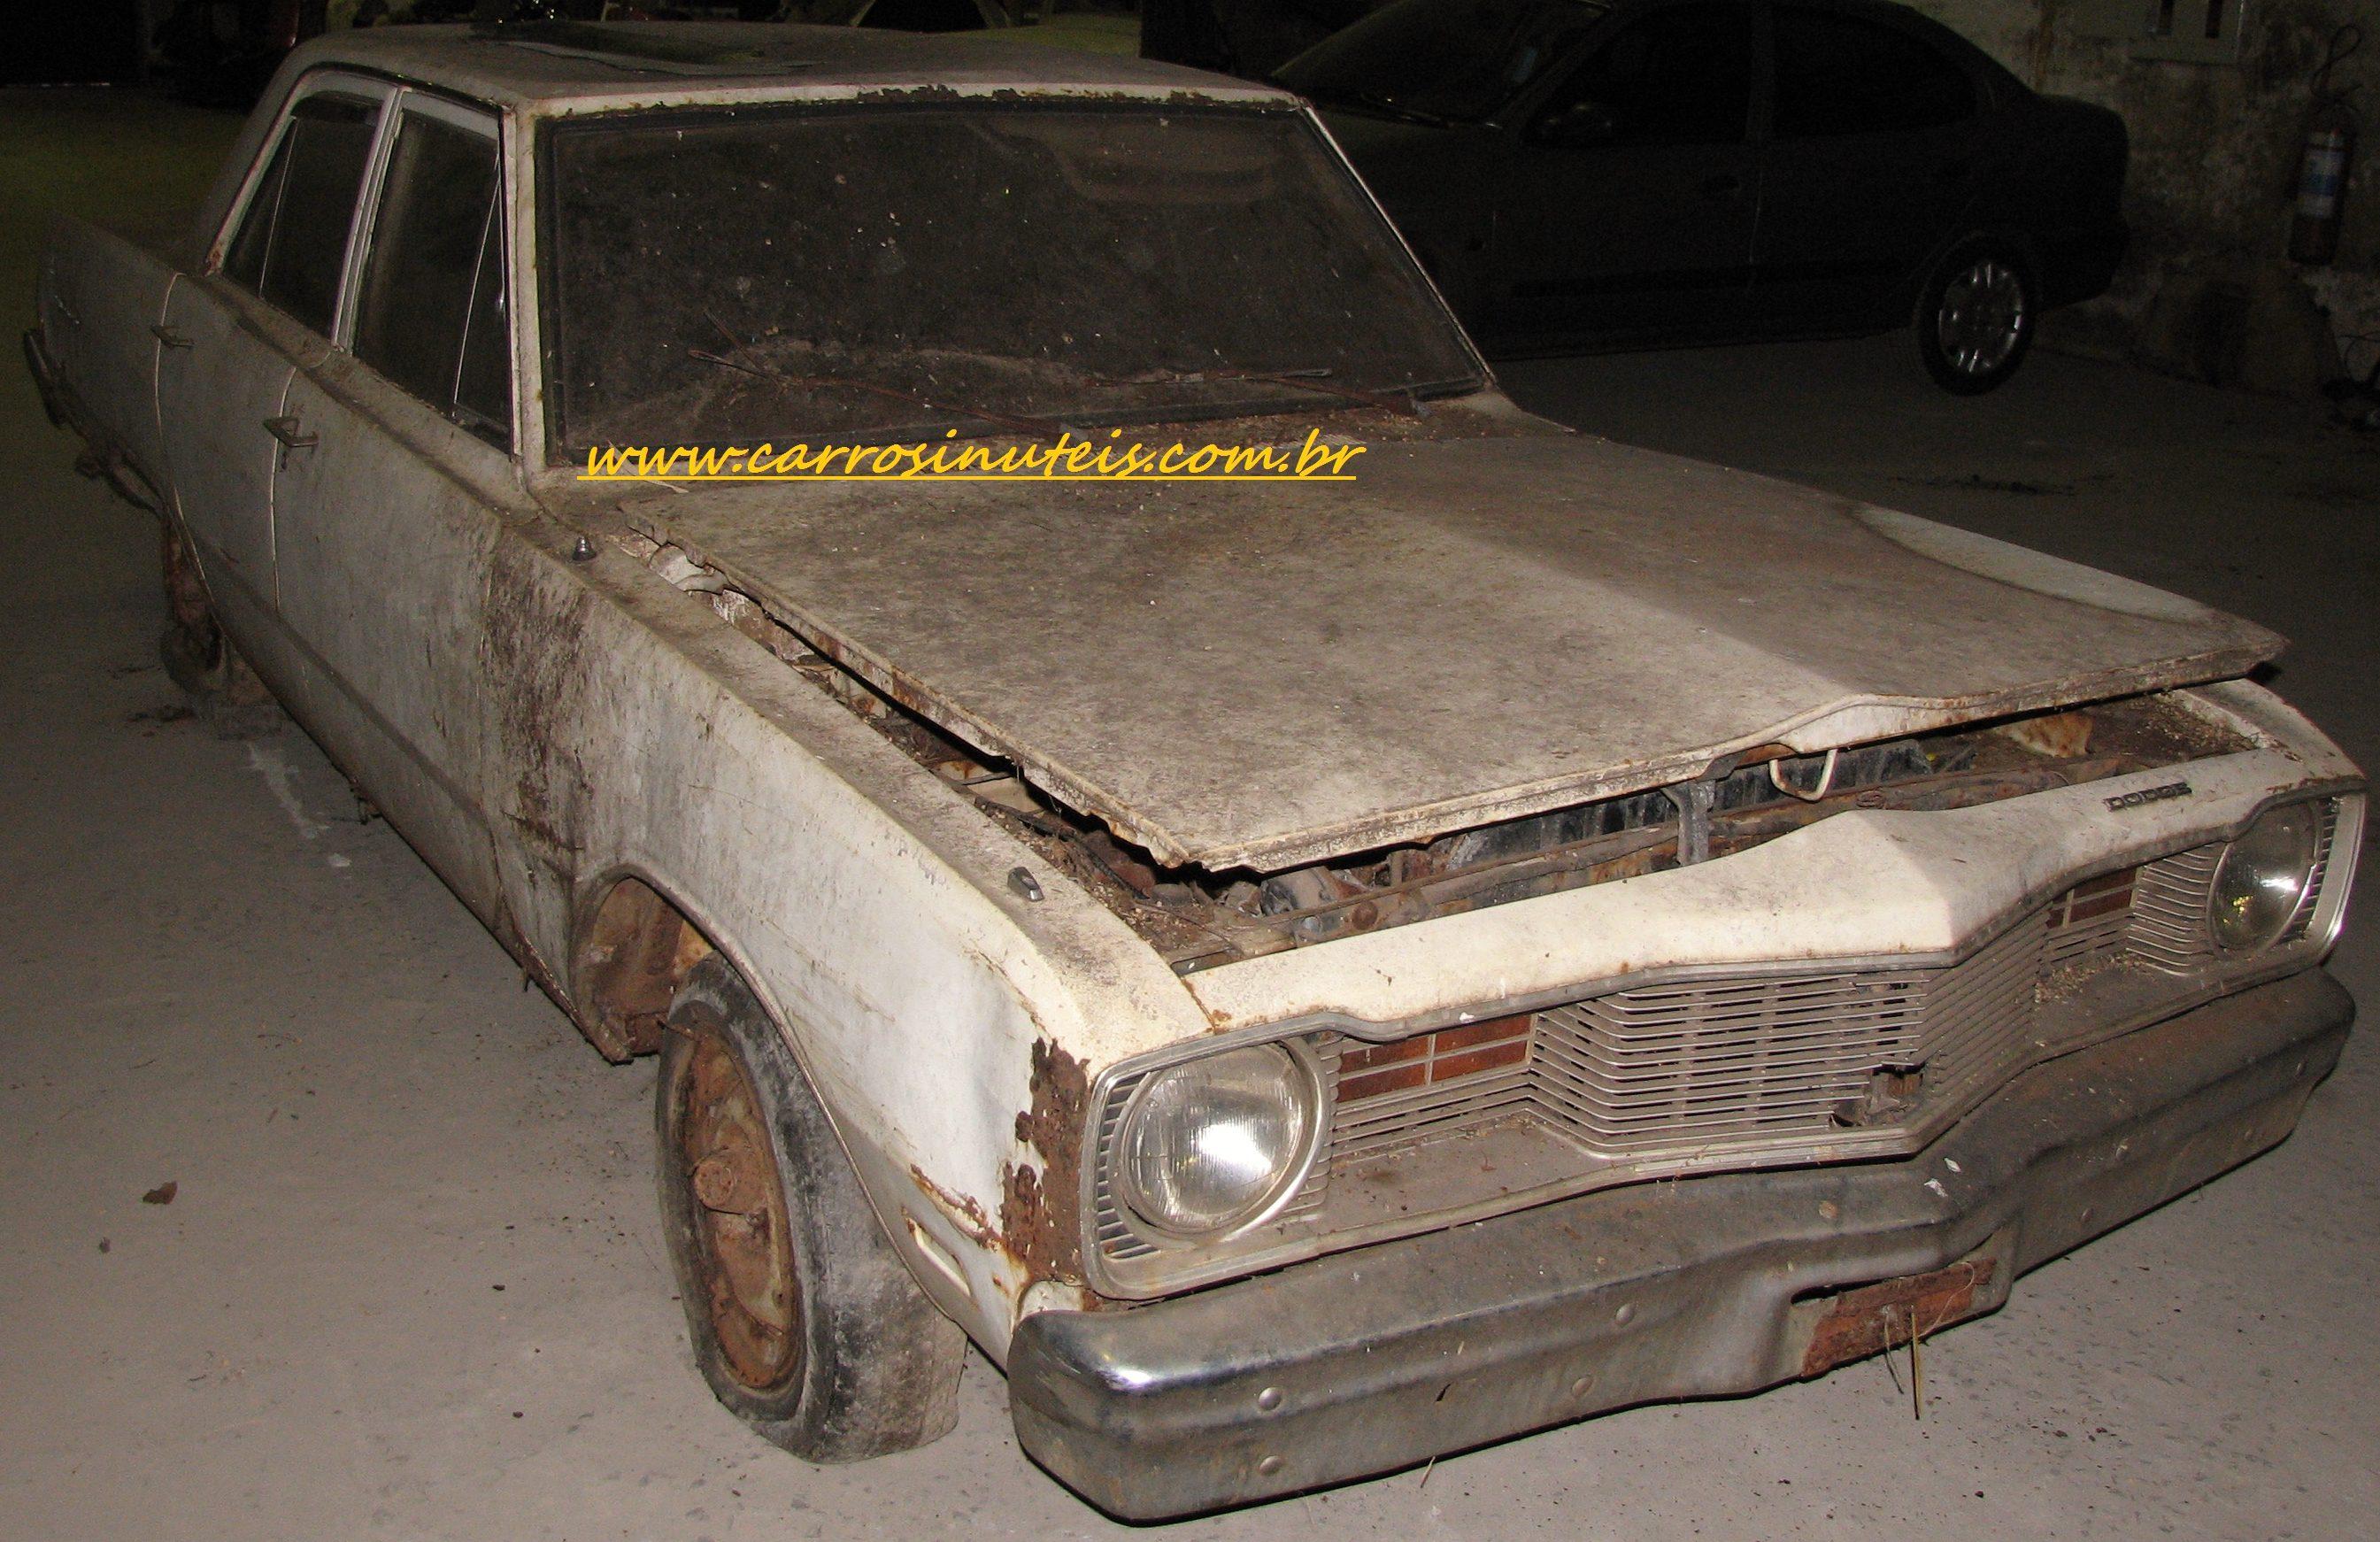 Mauricio-Paiva-BH-MG-Dodge-Dart-Sedan Dodge Dart